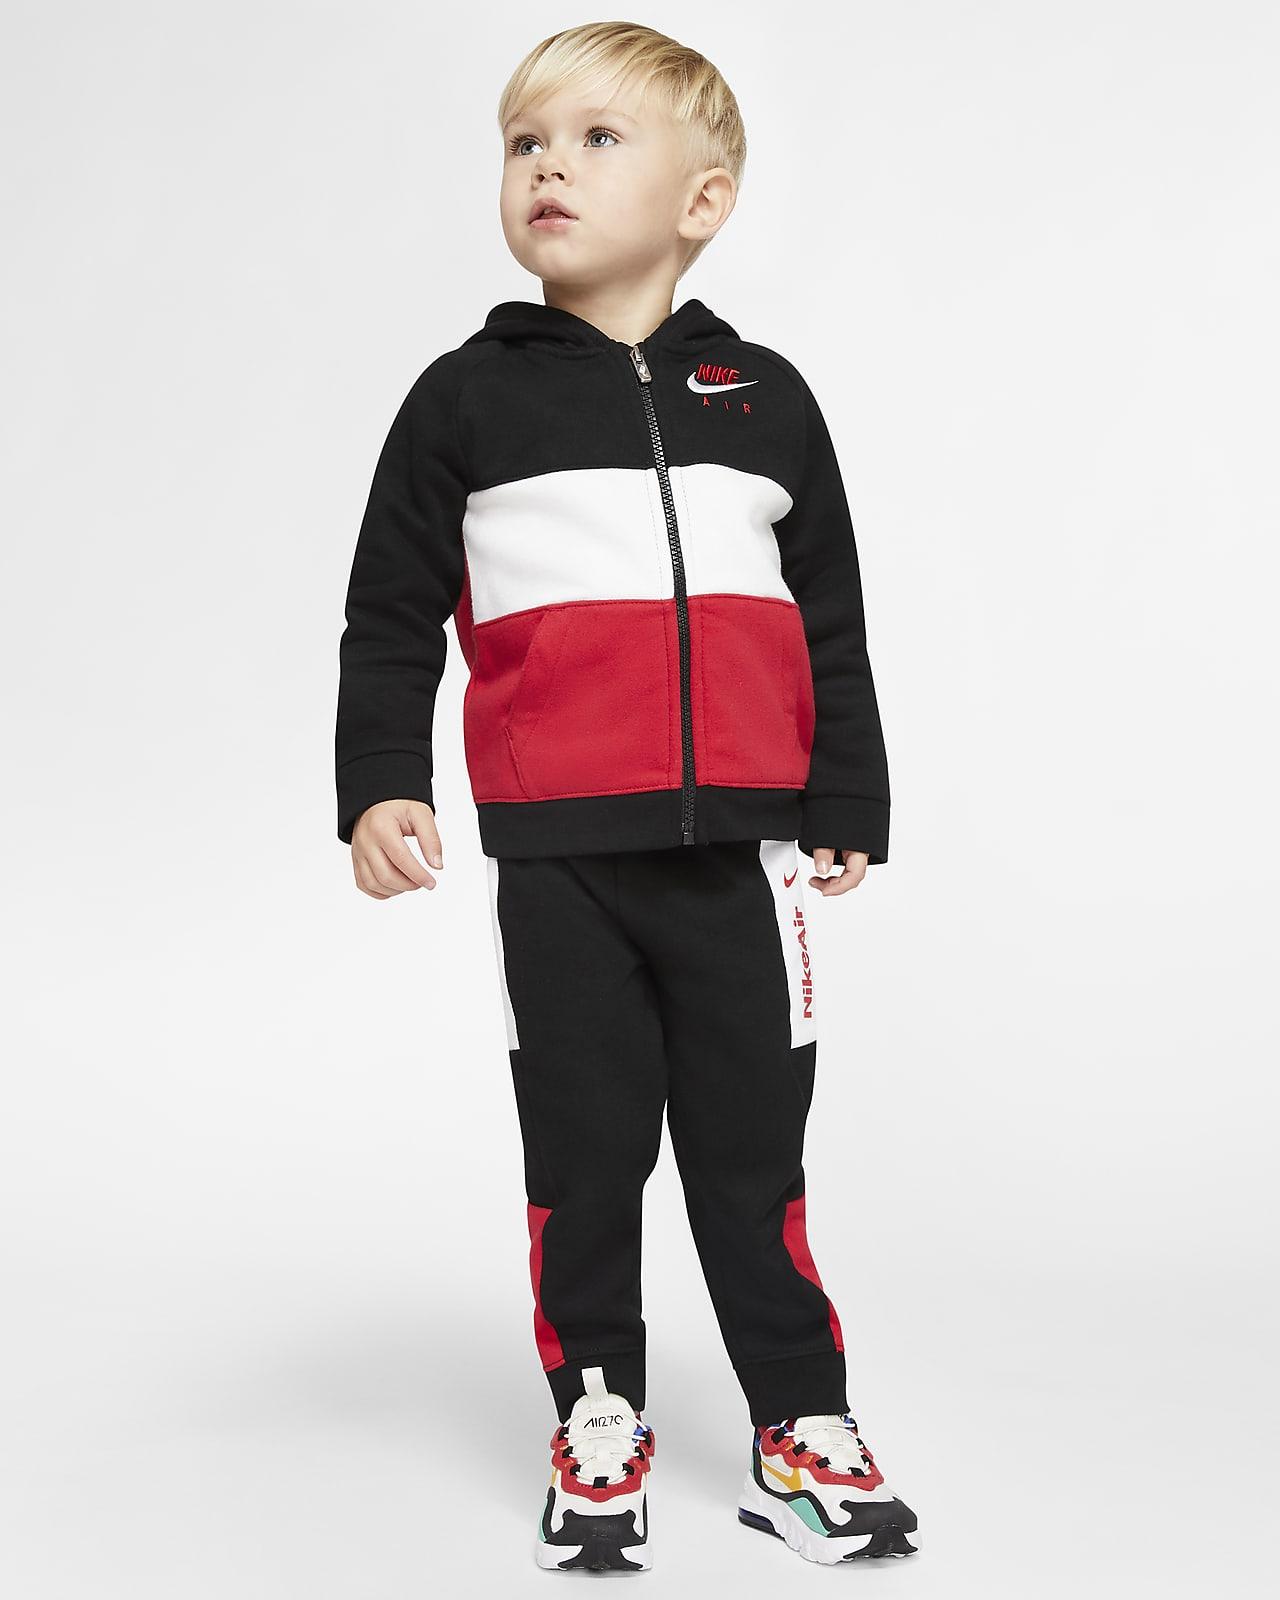 Drástico azufre martes  Nike Air Baby (12-24M) Hoodie and Joggers Set. Nike.com